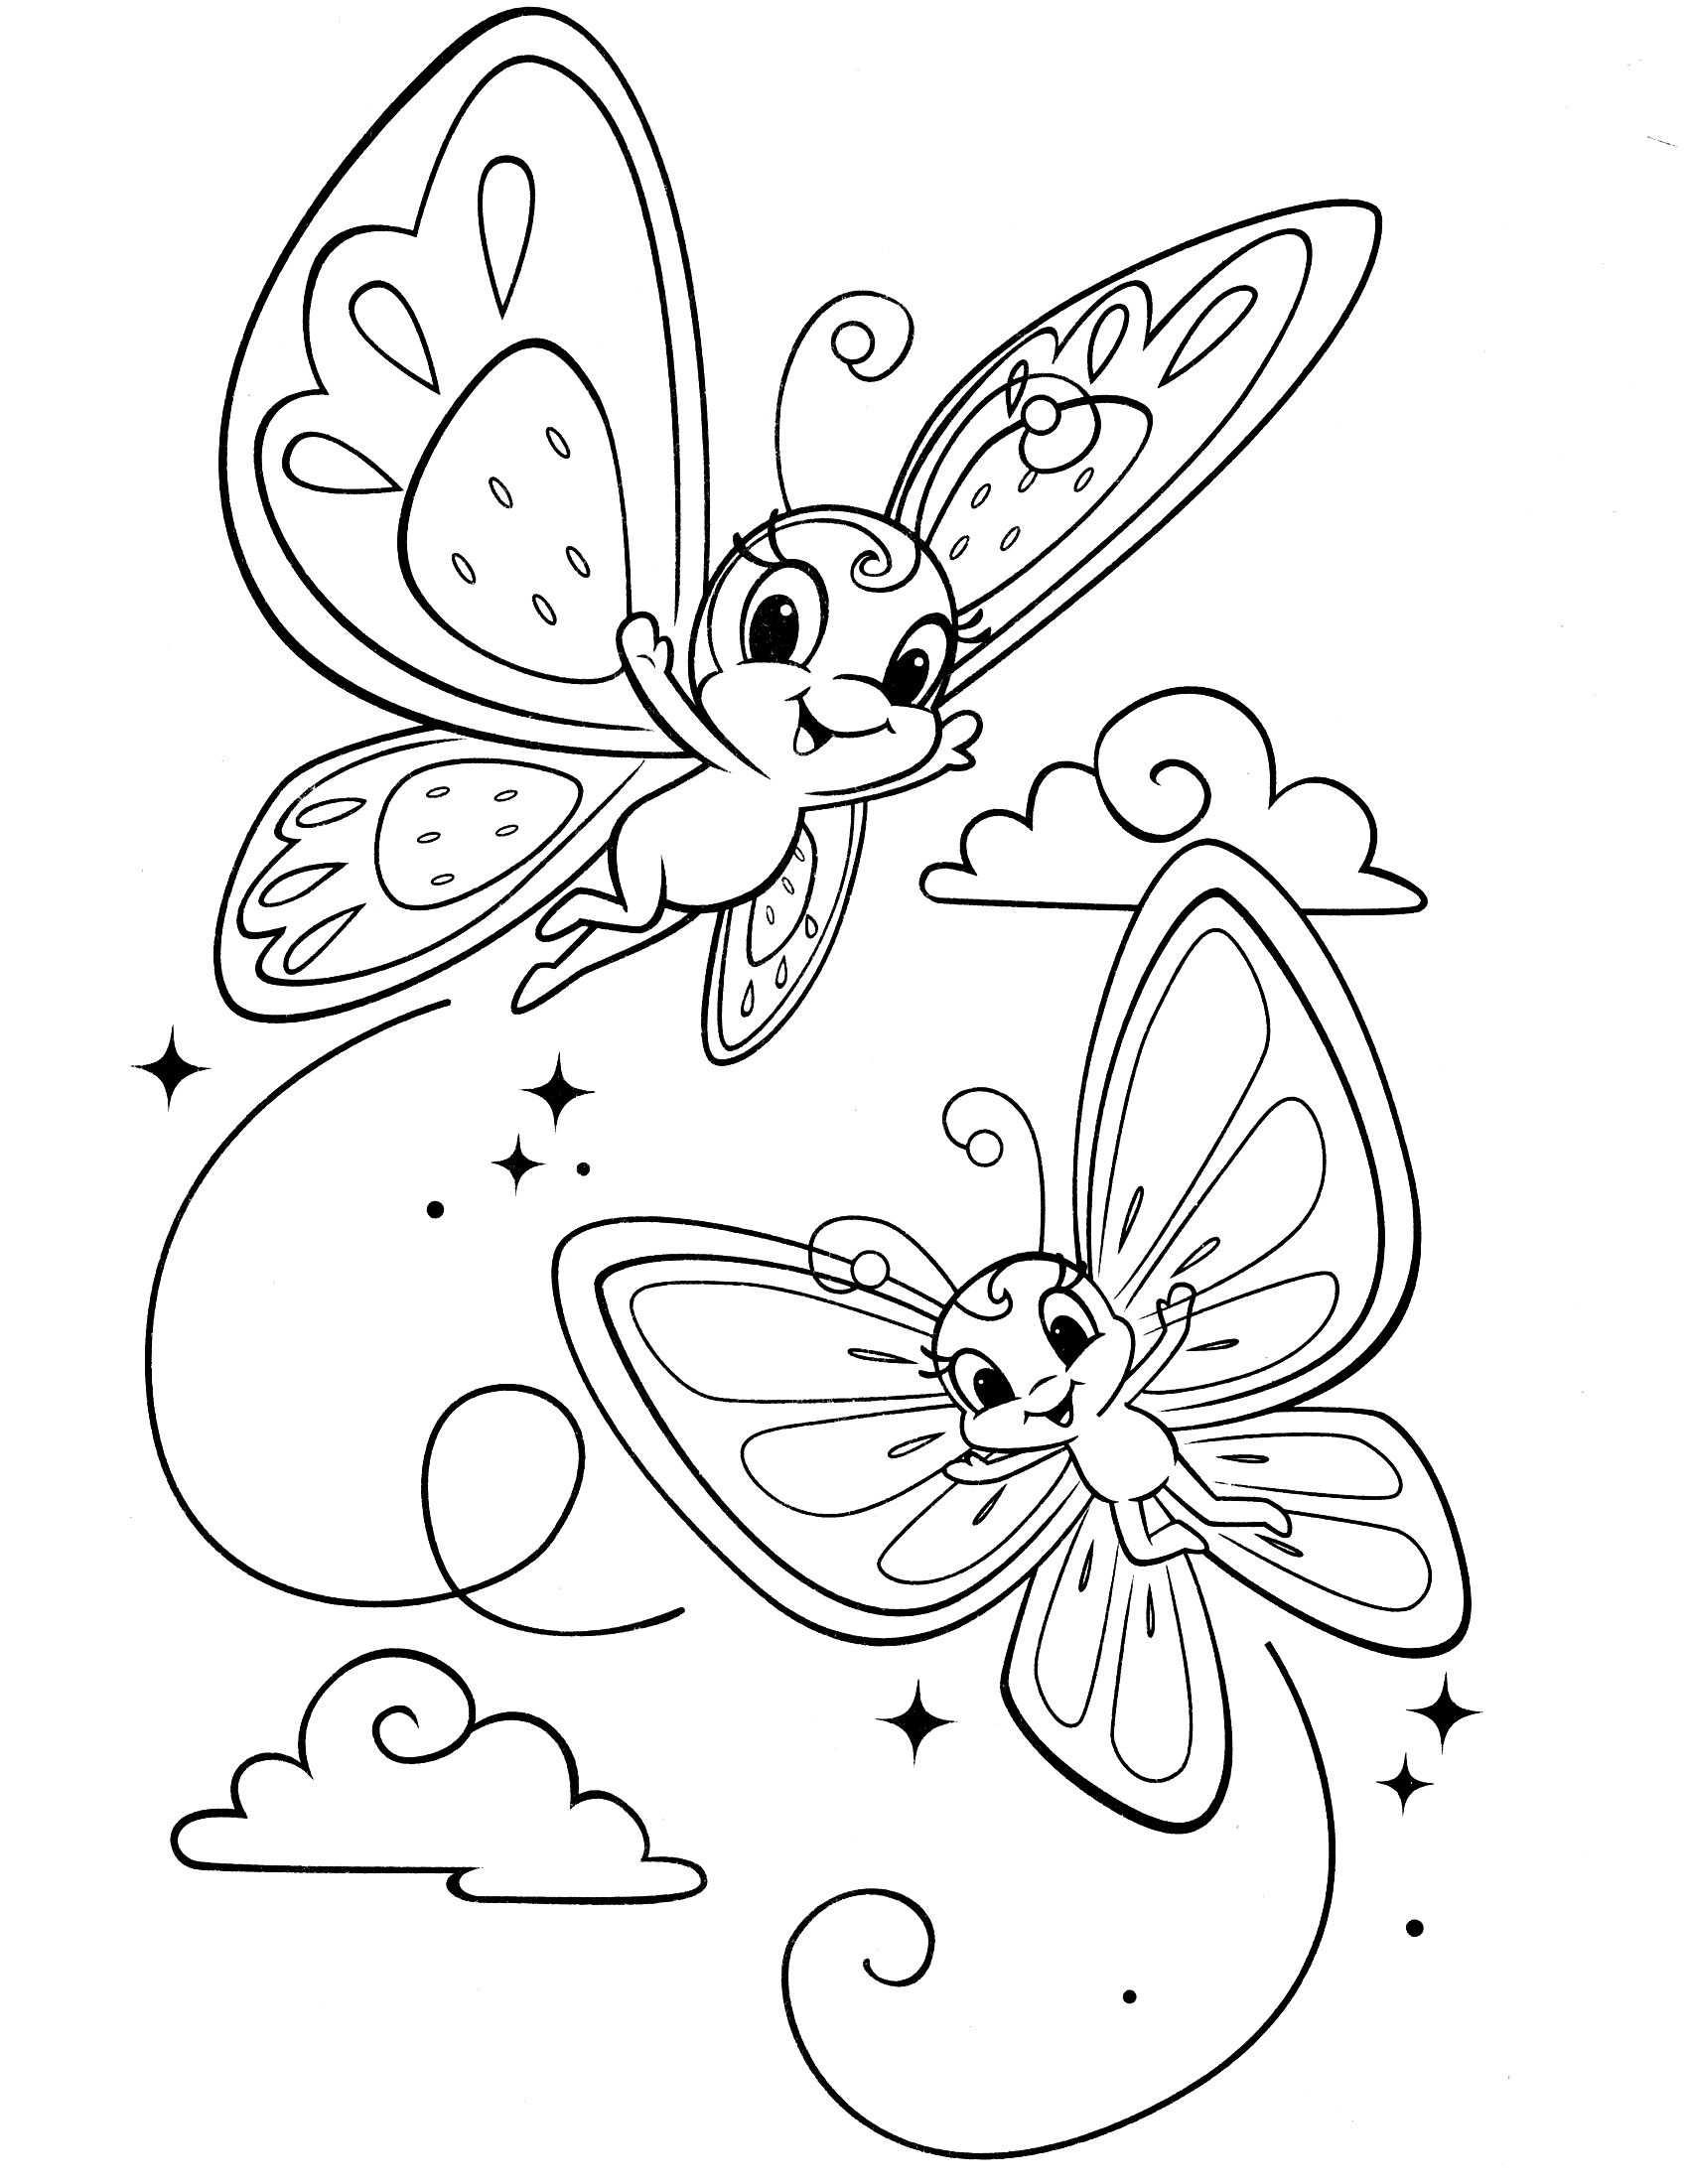 Kleurplaat Vlinders Geprint Mit Bildern Ausmalbilder